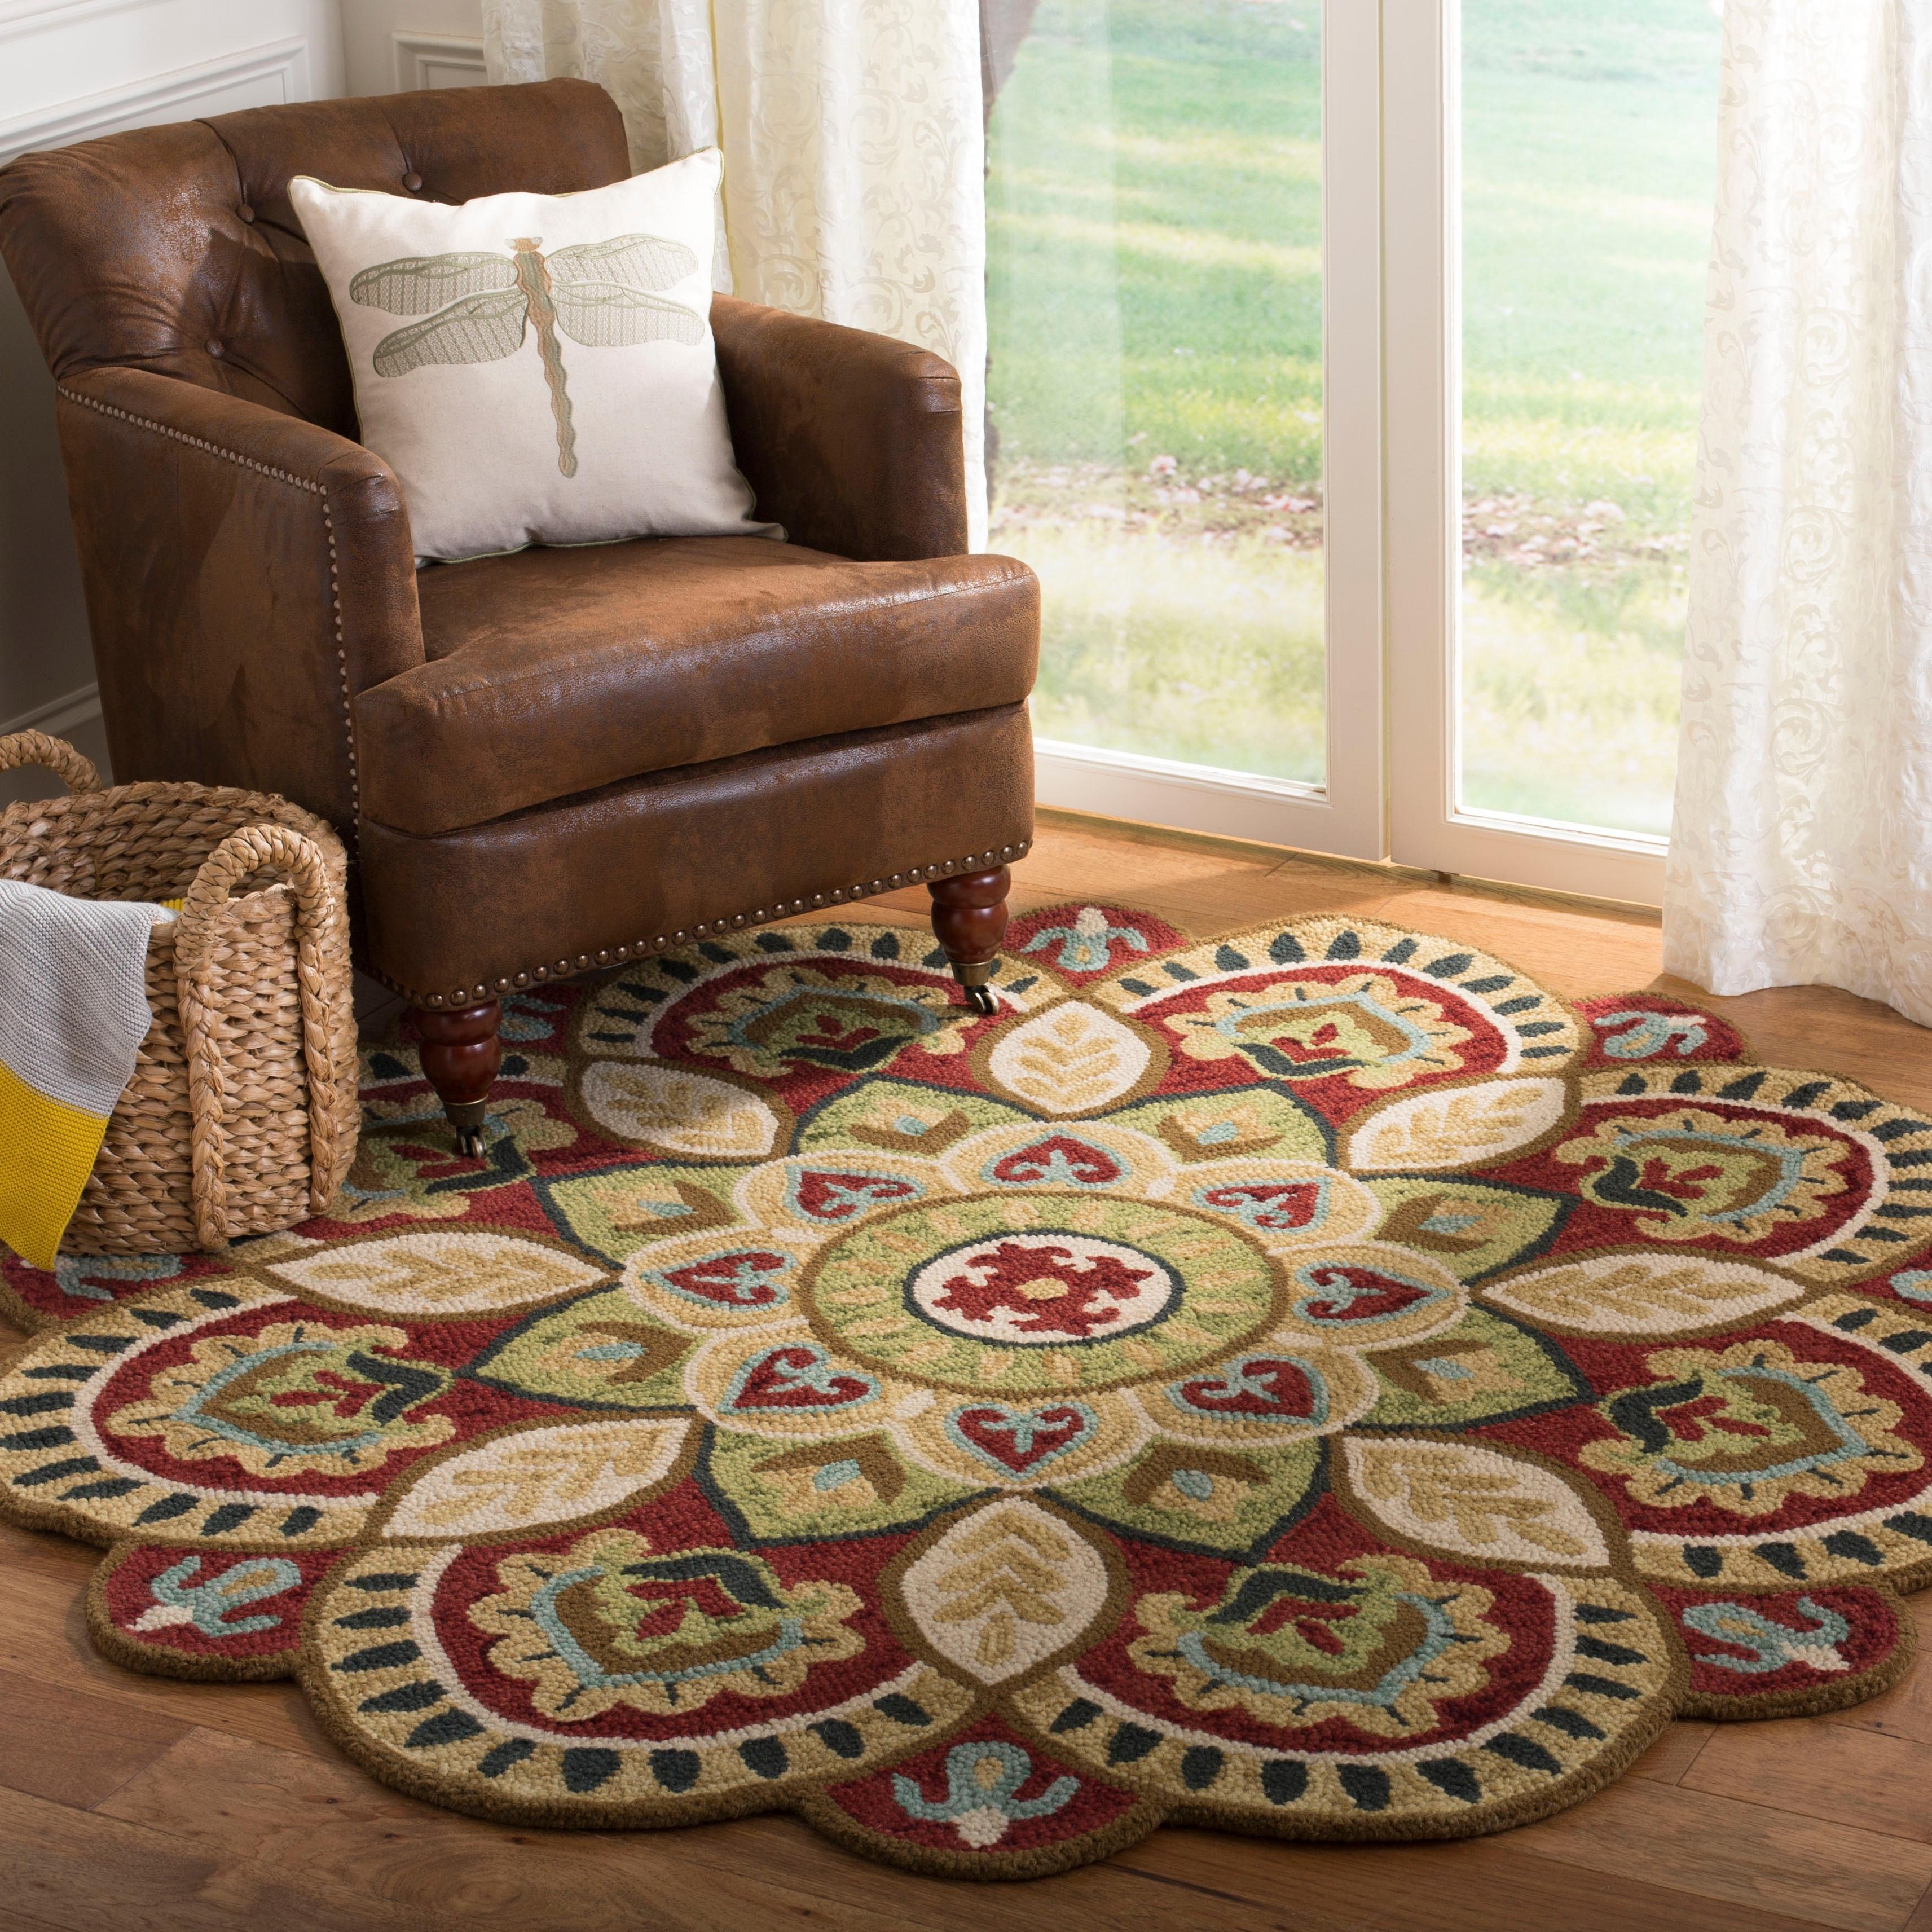 Safavieh Handmade Novelty Urtza Ornate Flower Wool Rug On Sale Overstock 22560020